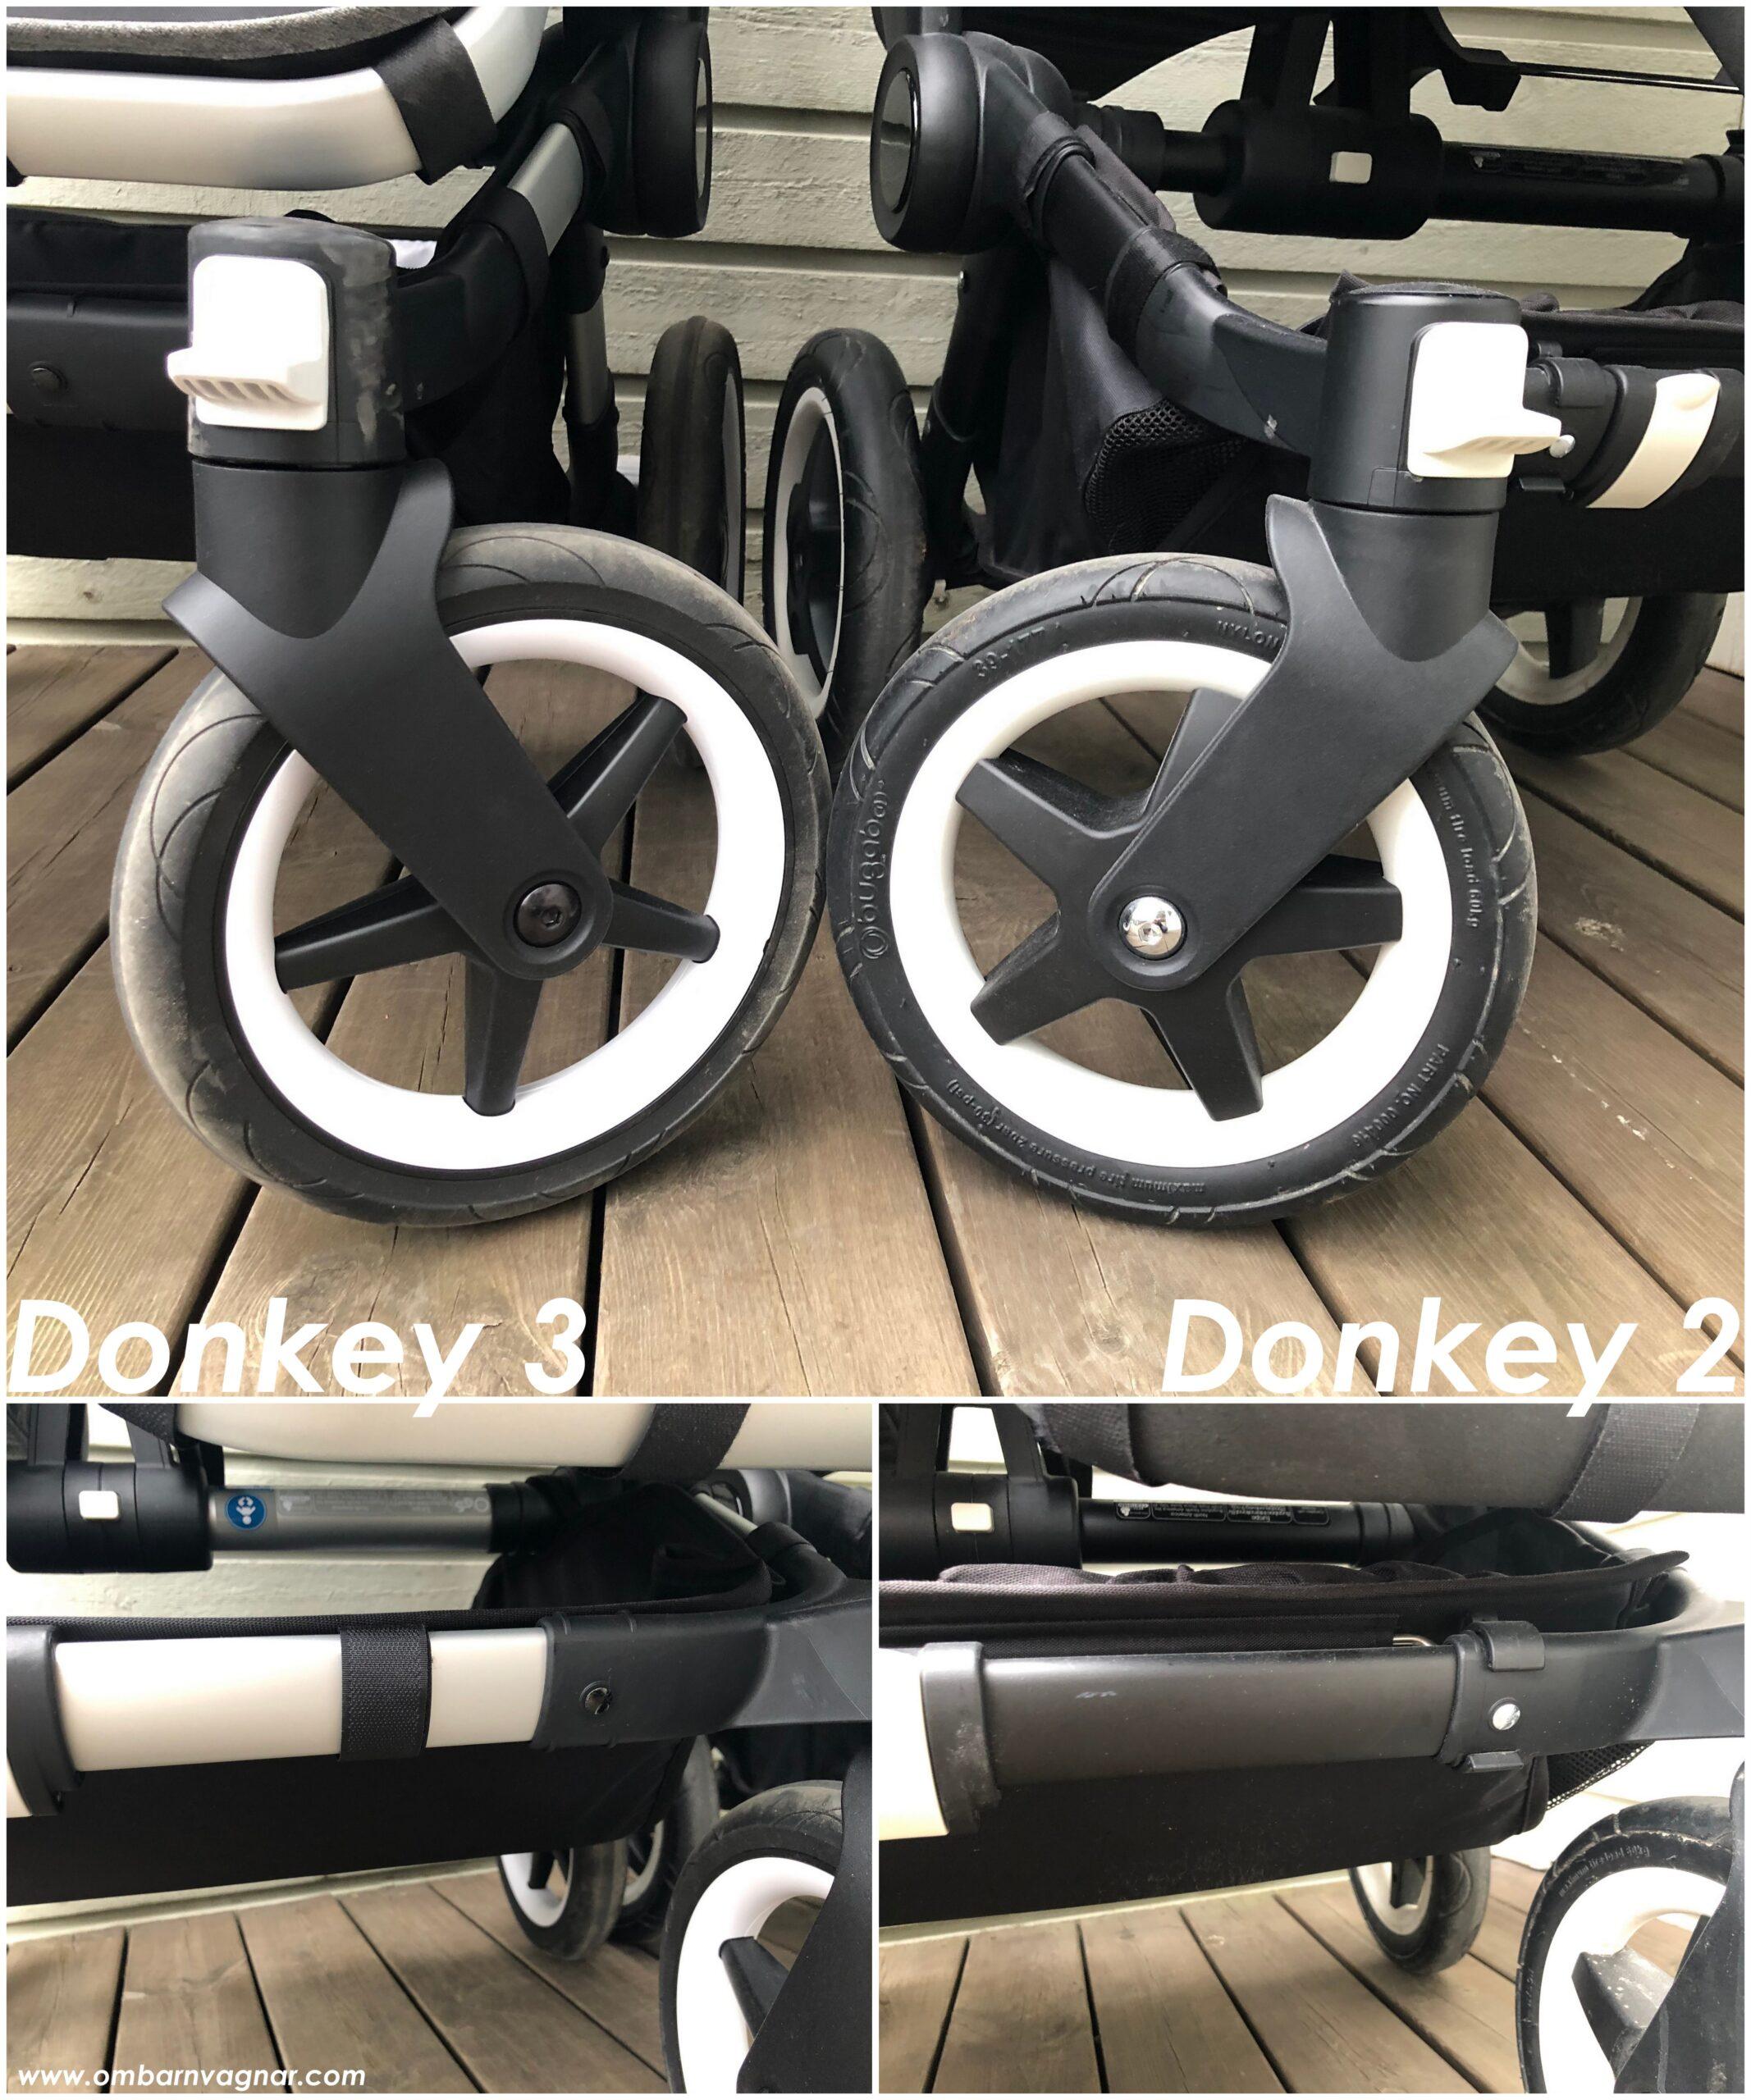 Bugaboo Donkey 2 och Bugaboo Donkey 3 har olika hjul och olika varukorgar